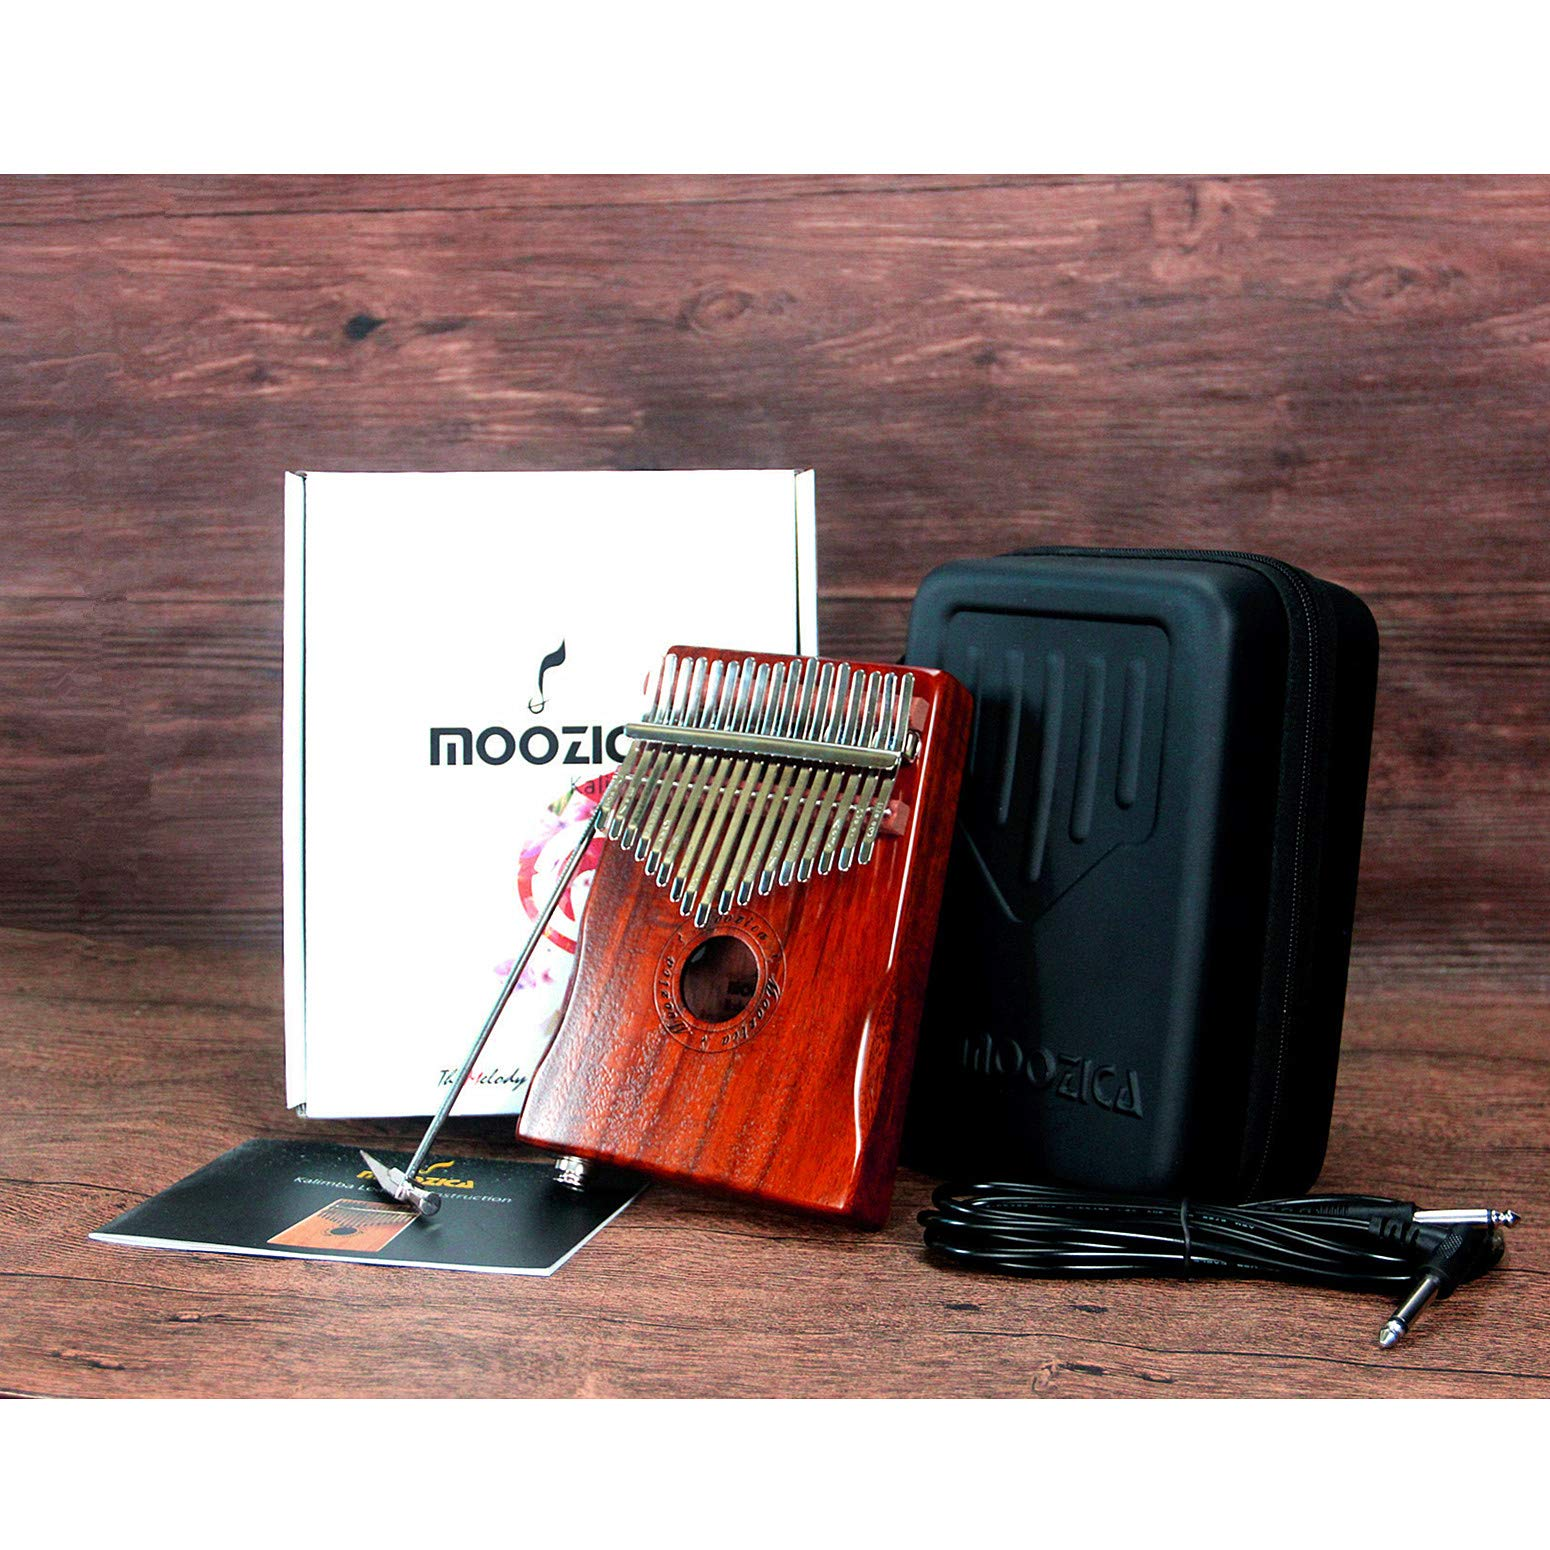 Moozica 17-Key EQ Kalimba, Koa Tone Wood Electric Finger Thumb Piano Built-in Pickup With 6.35mm Audio Interface and Professional Kalimba Bag by Moozica (Image #7)